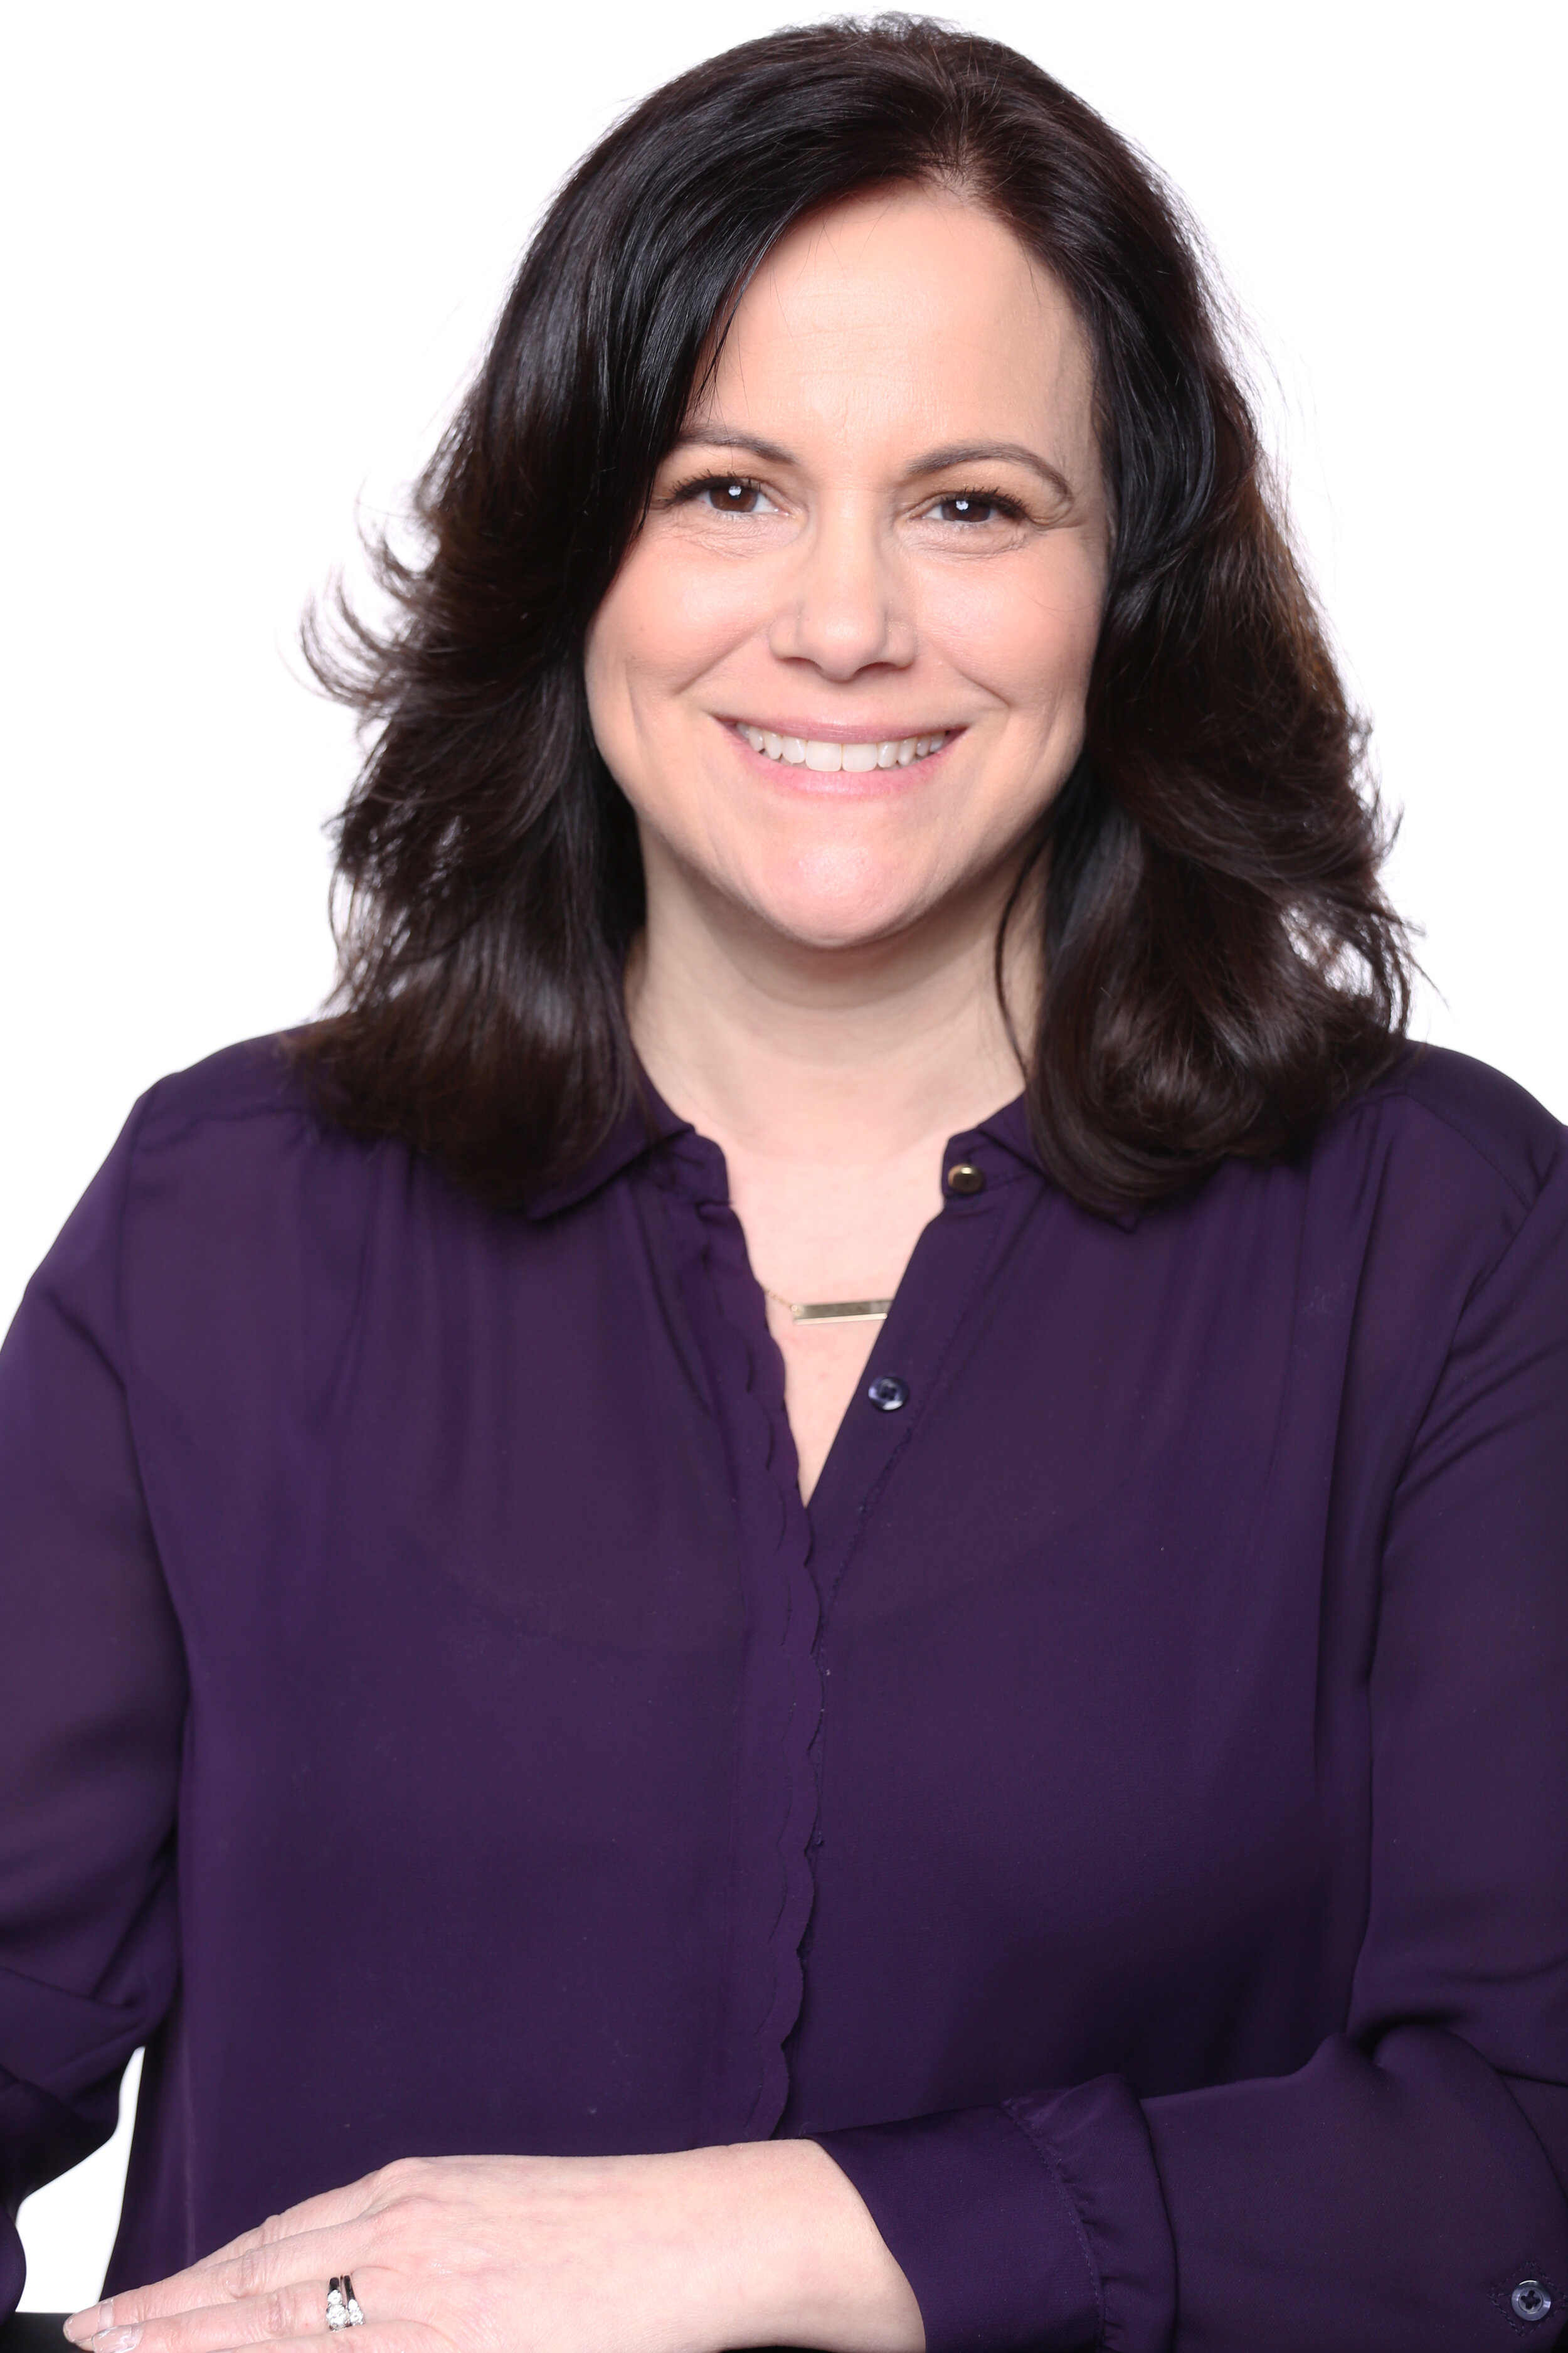 Andi Foley - Community Manager, Chaddwell Apartments